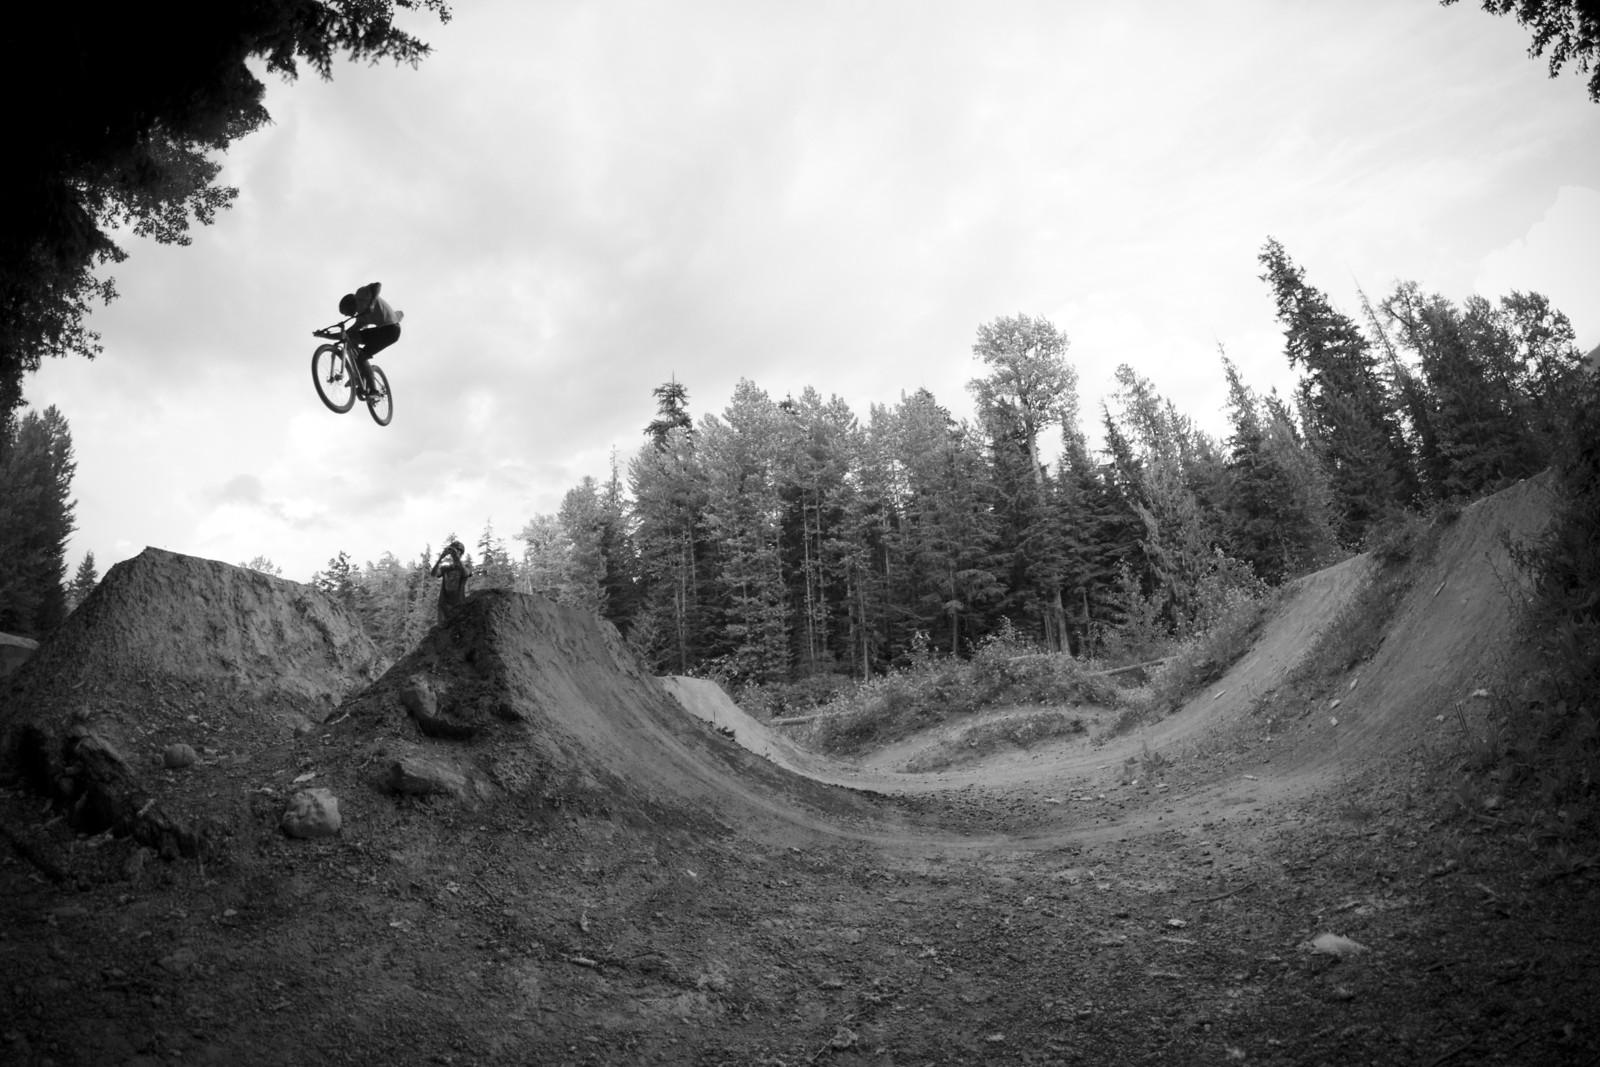 Santa Sideways - jamieledson - Mountain Biking Pictures - Vital MTB